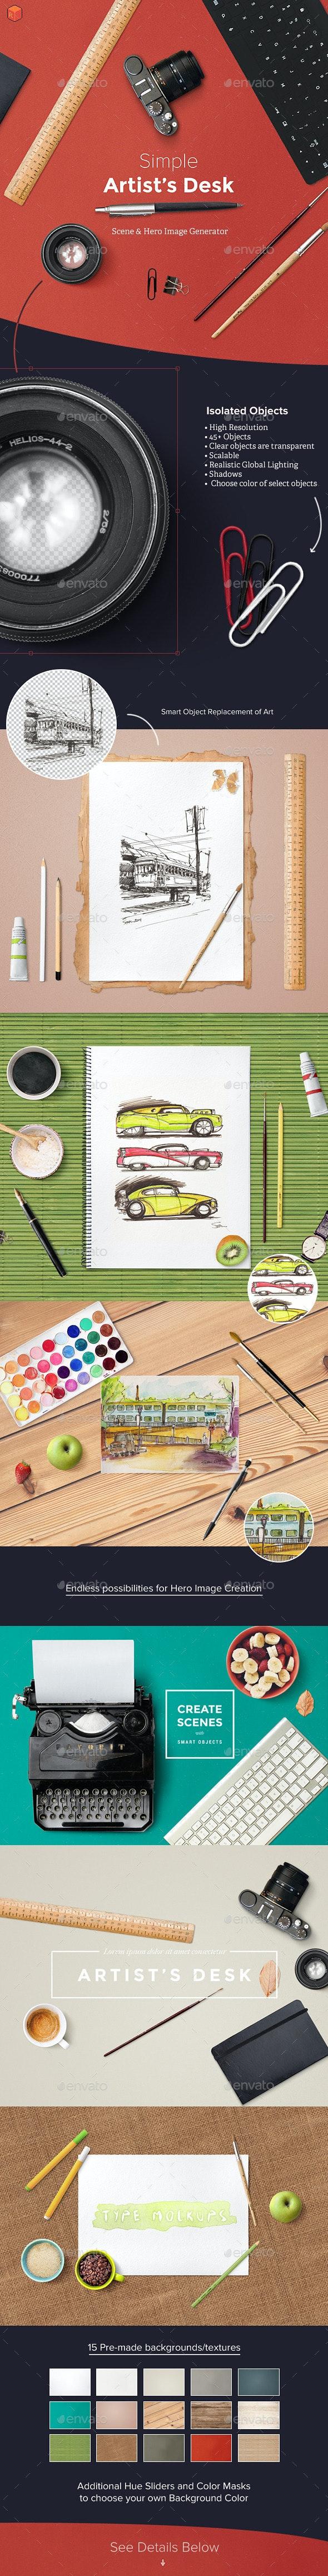 Artist's Desk Scene and Hero Image Generator - Hero Images Graphics